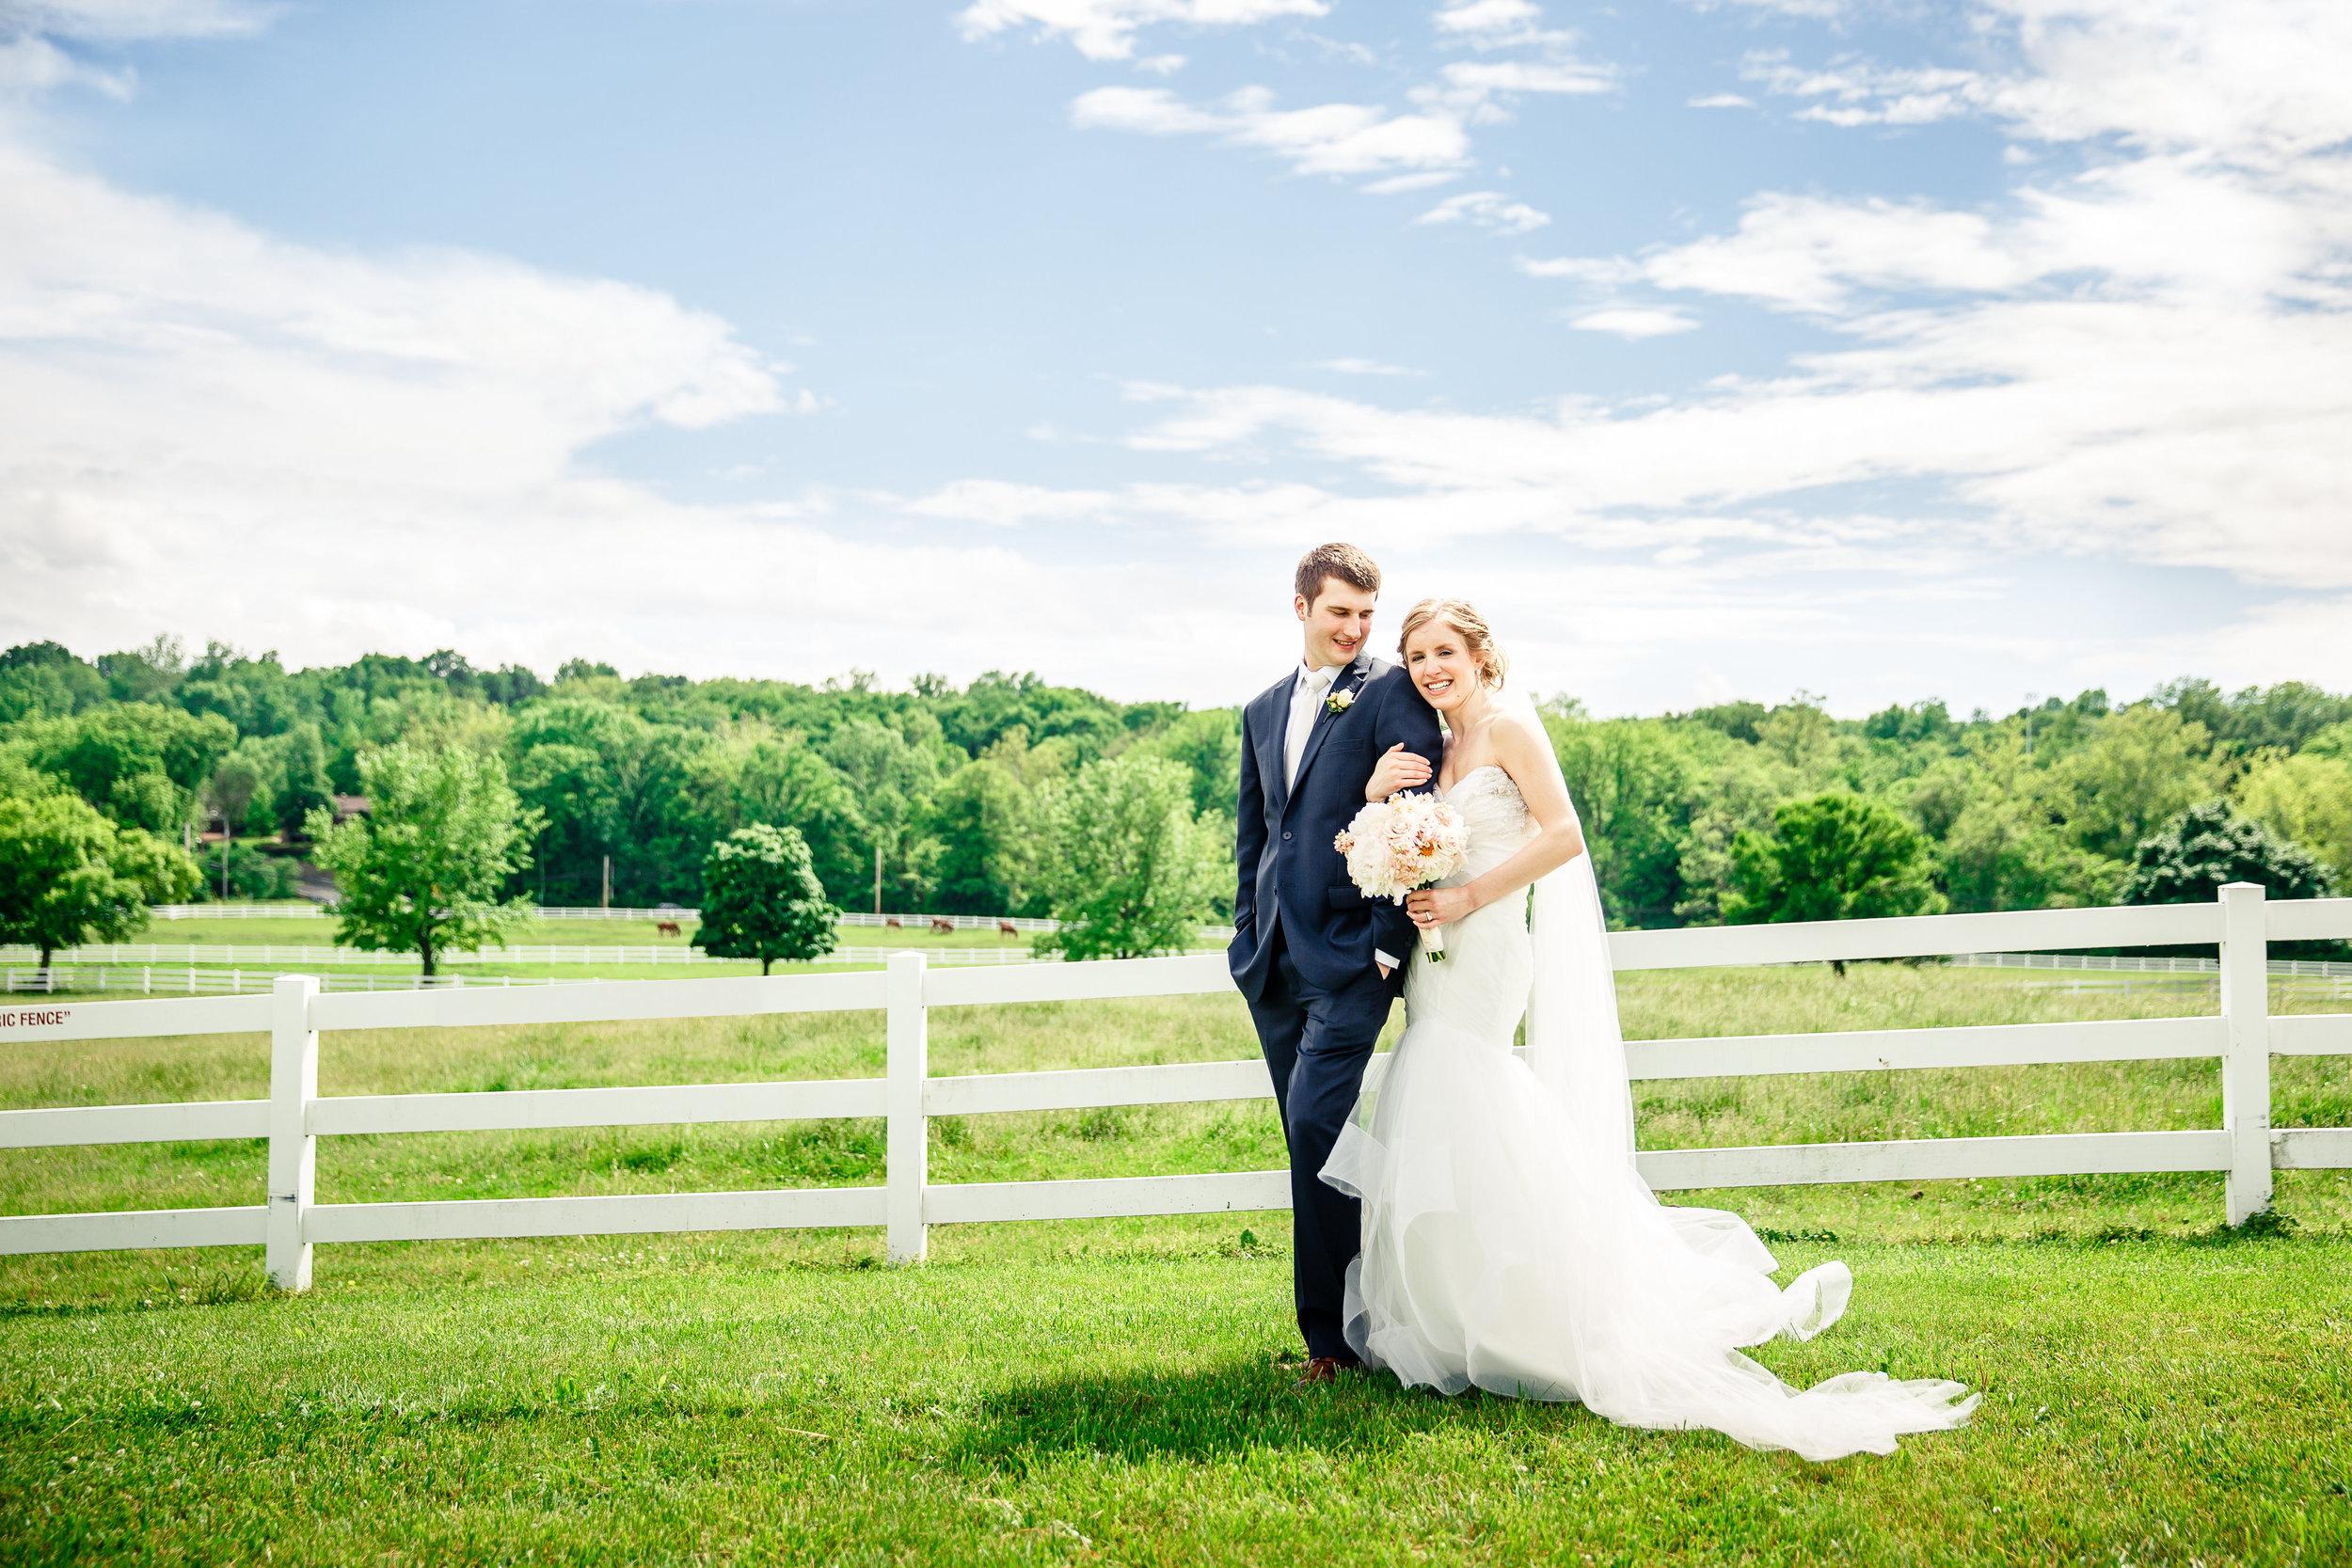 Grant's Farm St. Louis Wedding Photographer Oldani Photography 6.jpg